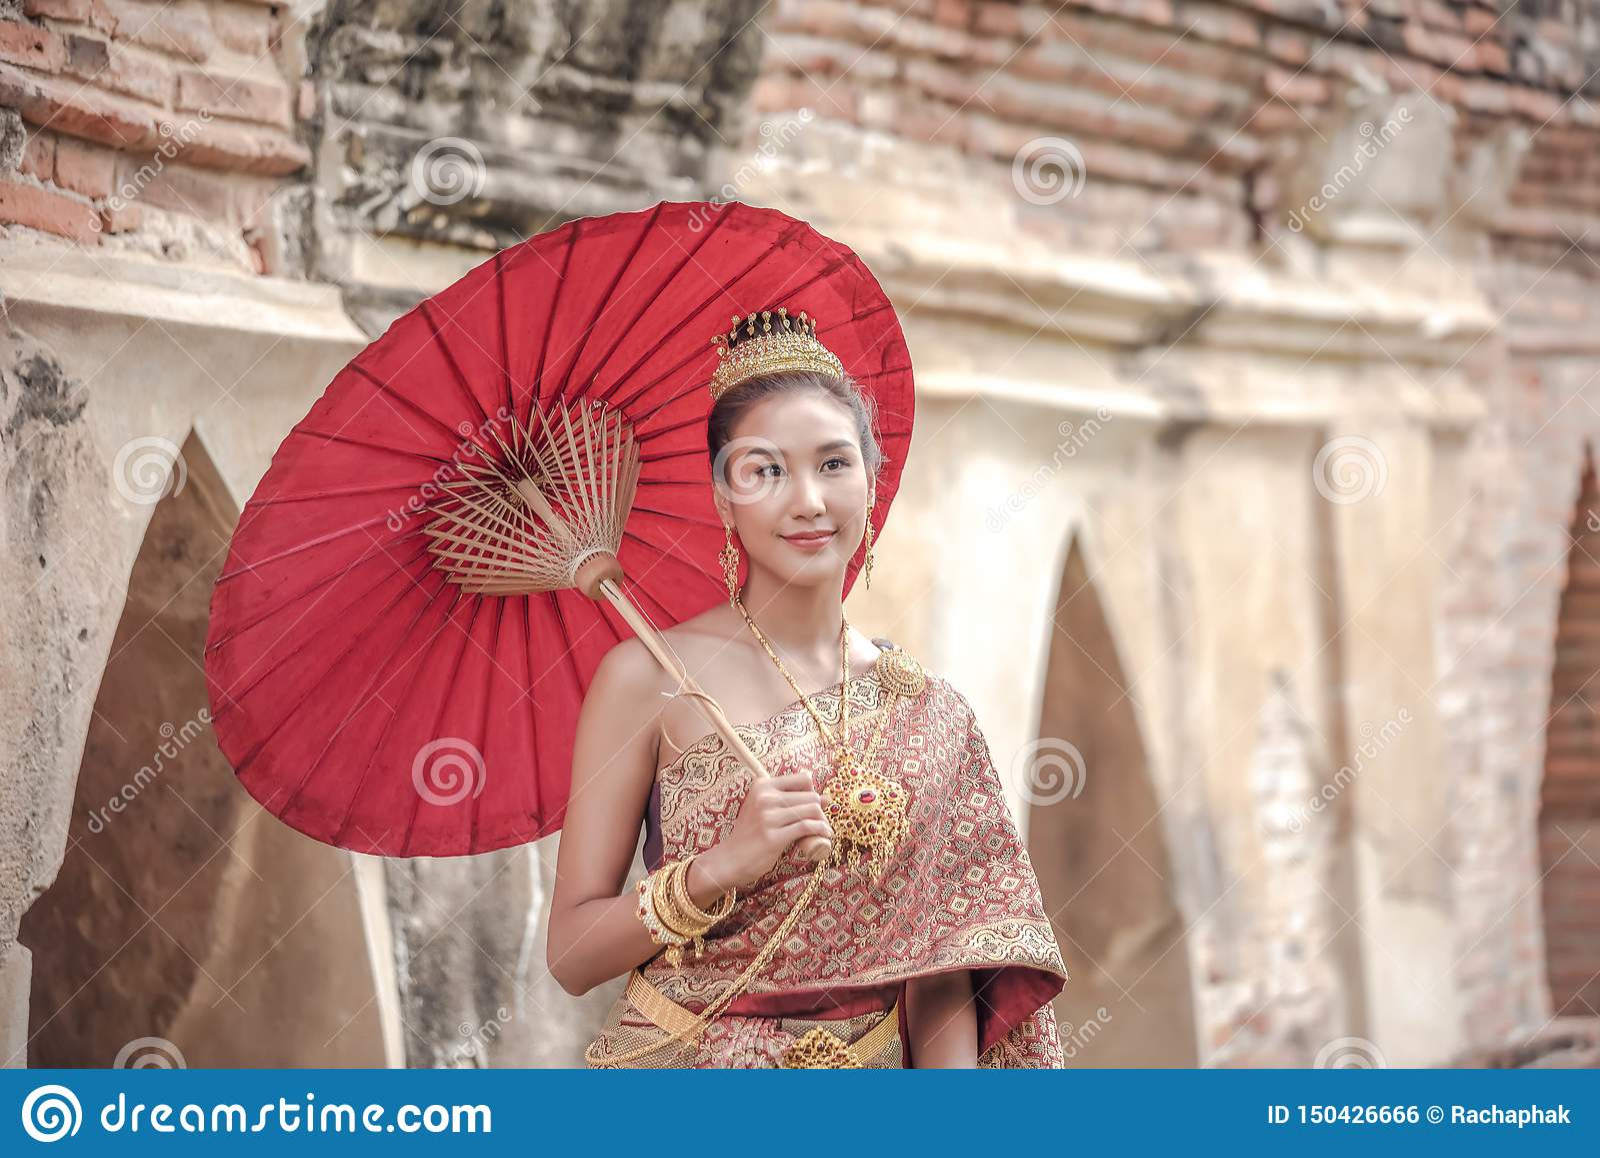 Beautiful Thai Girl In Thai Costume - Wearing Bride Dress